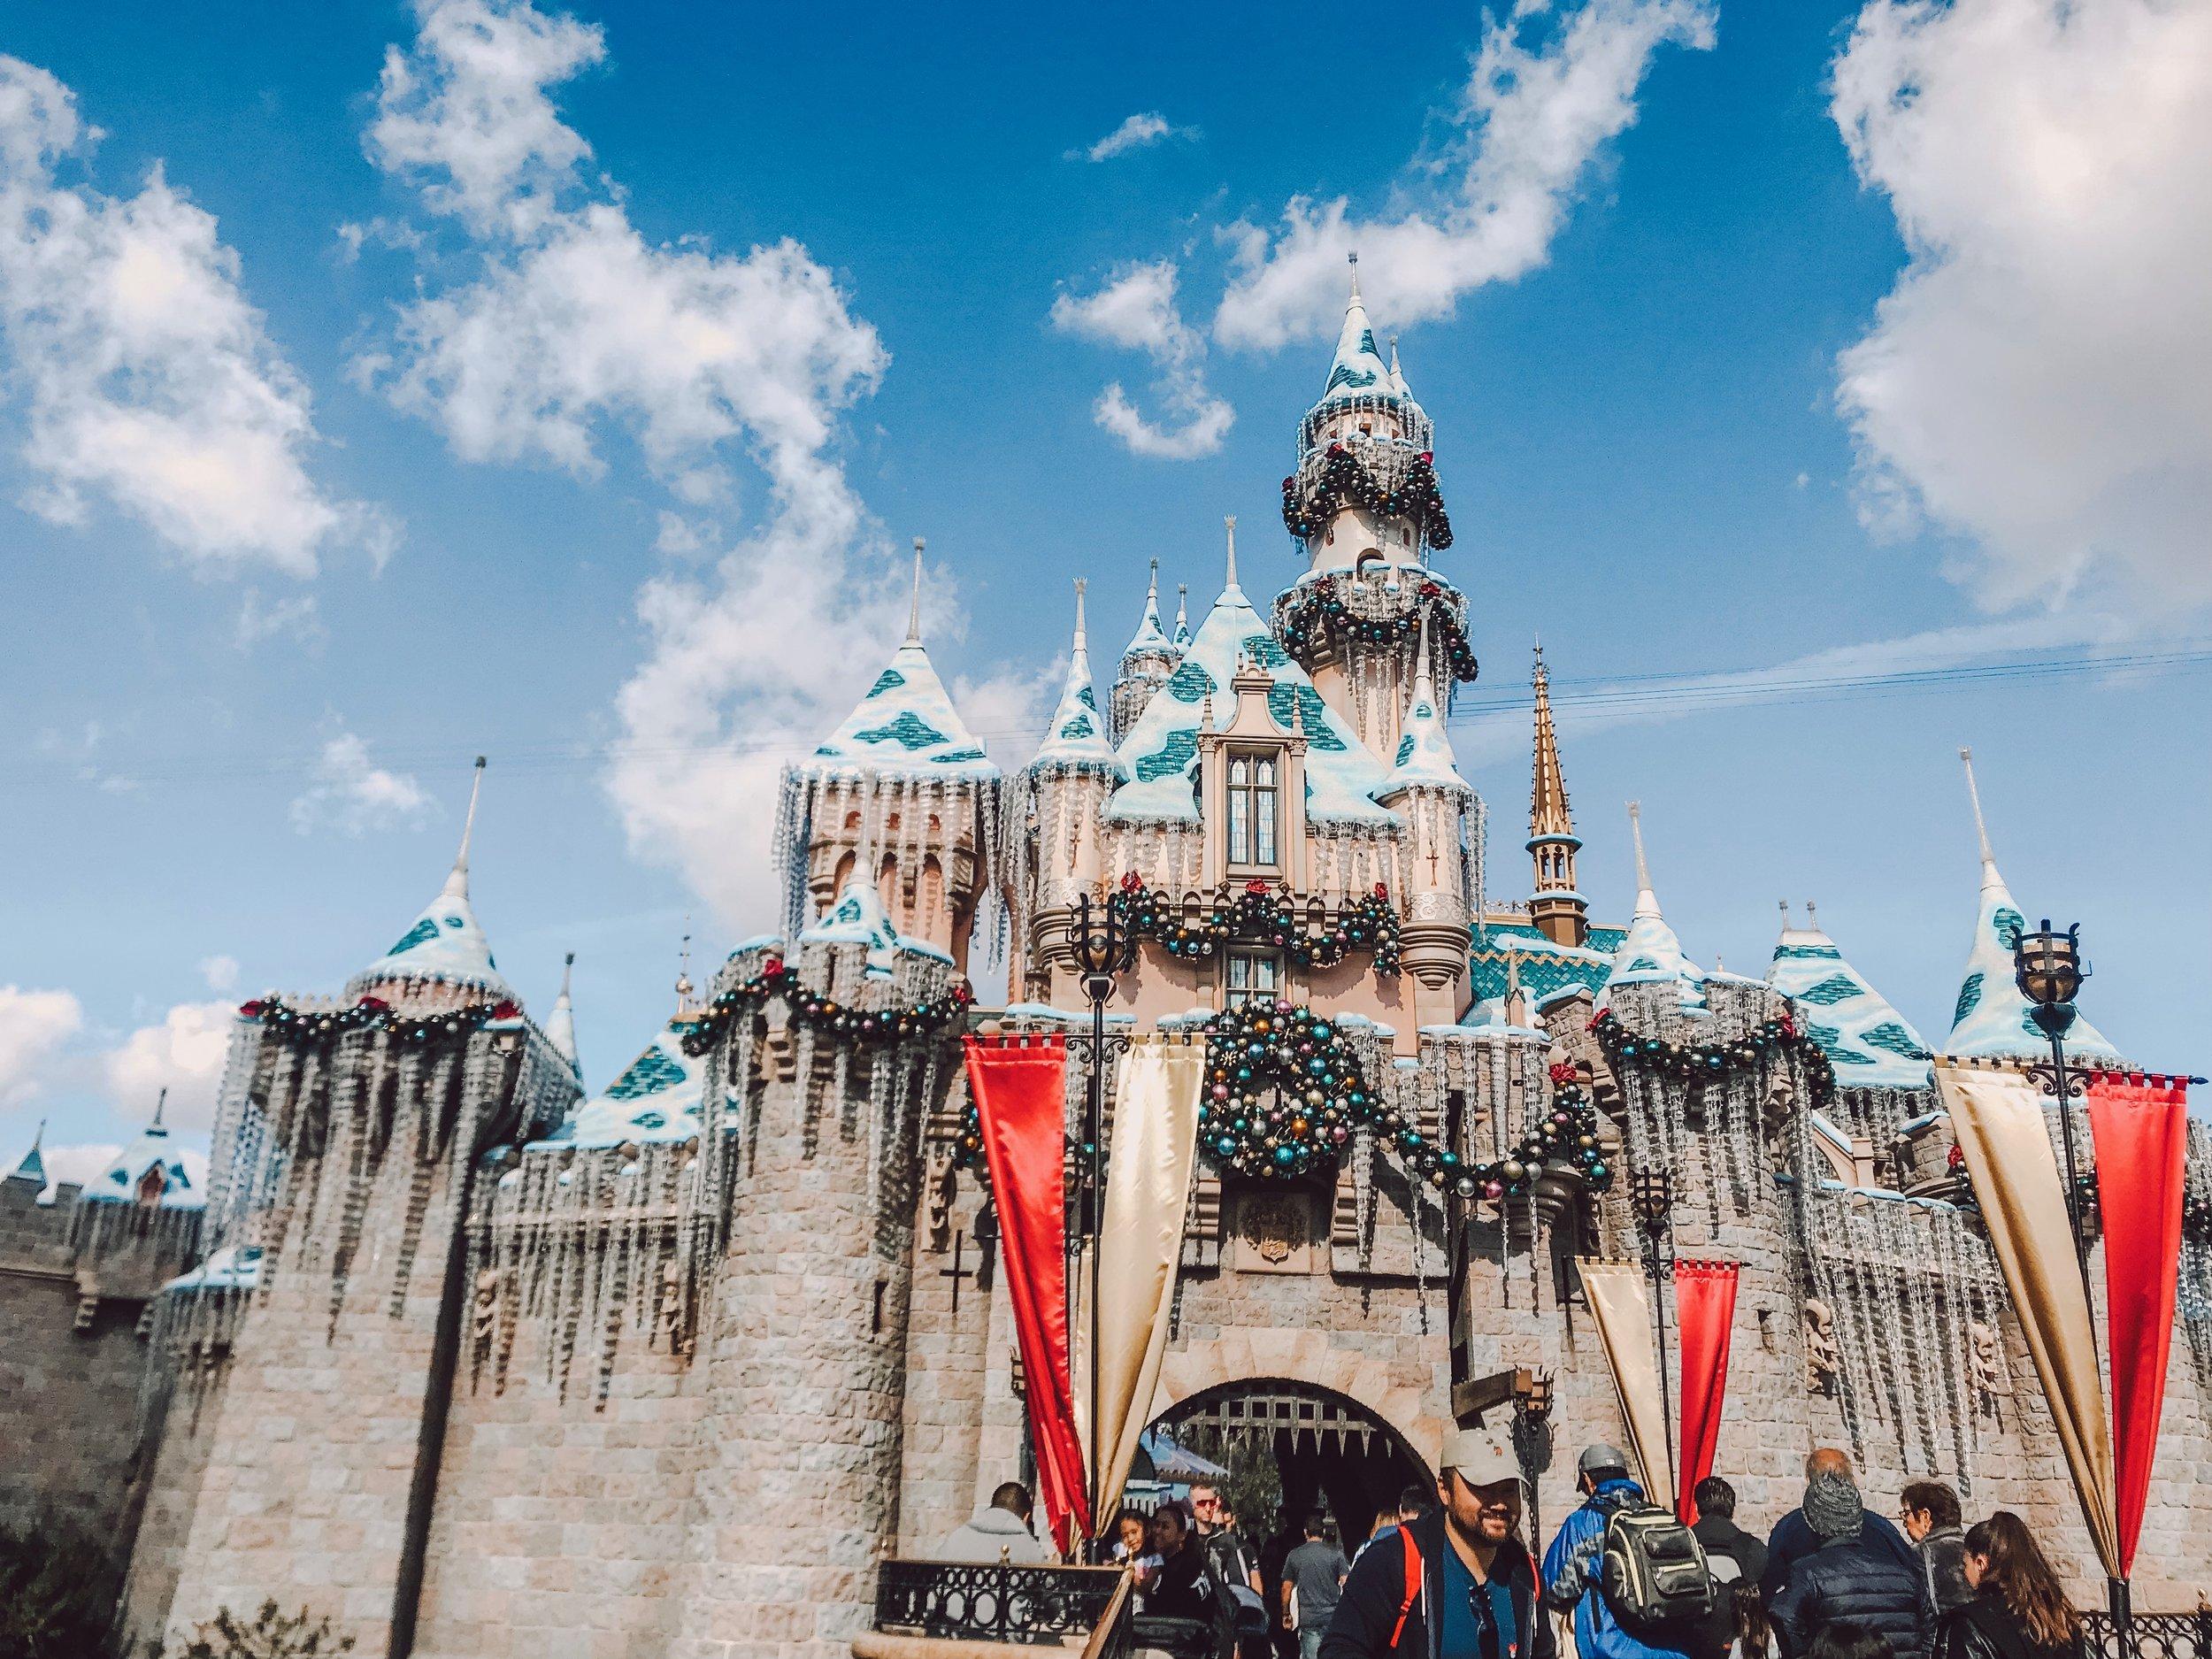 Castle in Disneyland.jpg